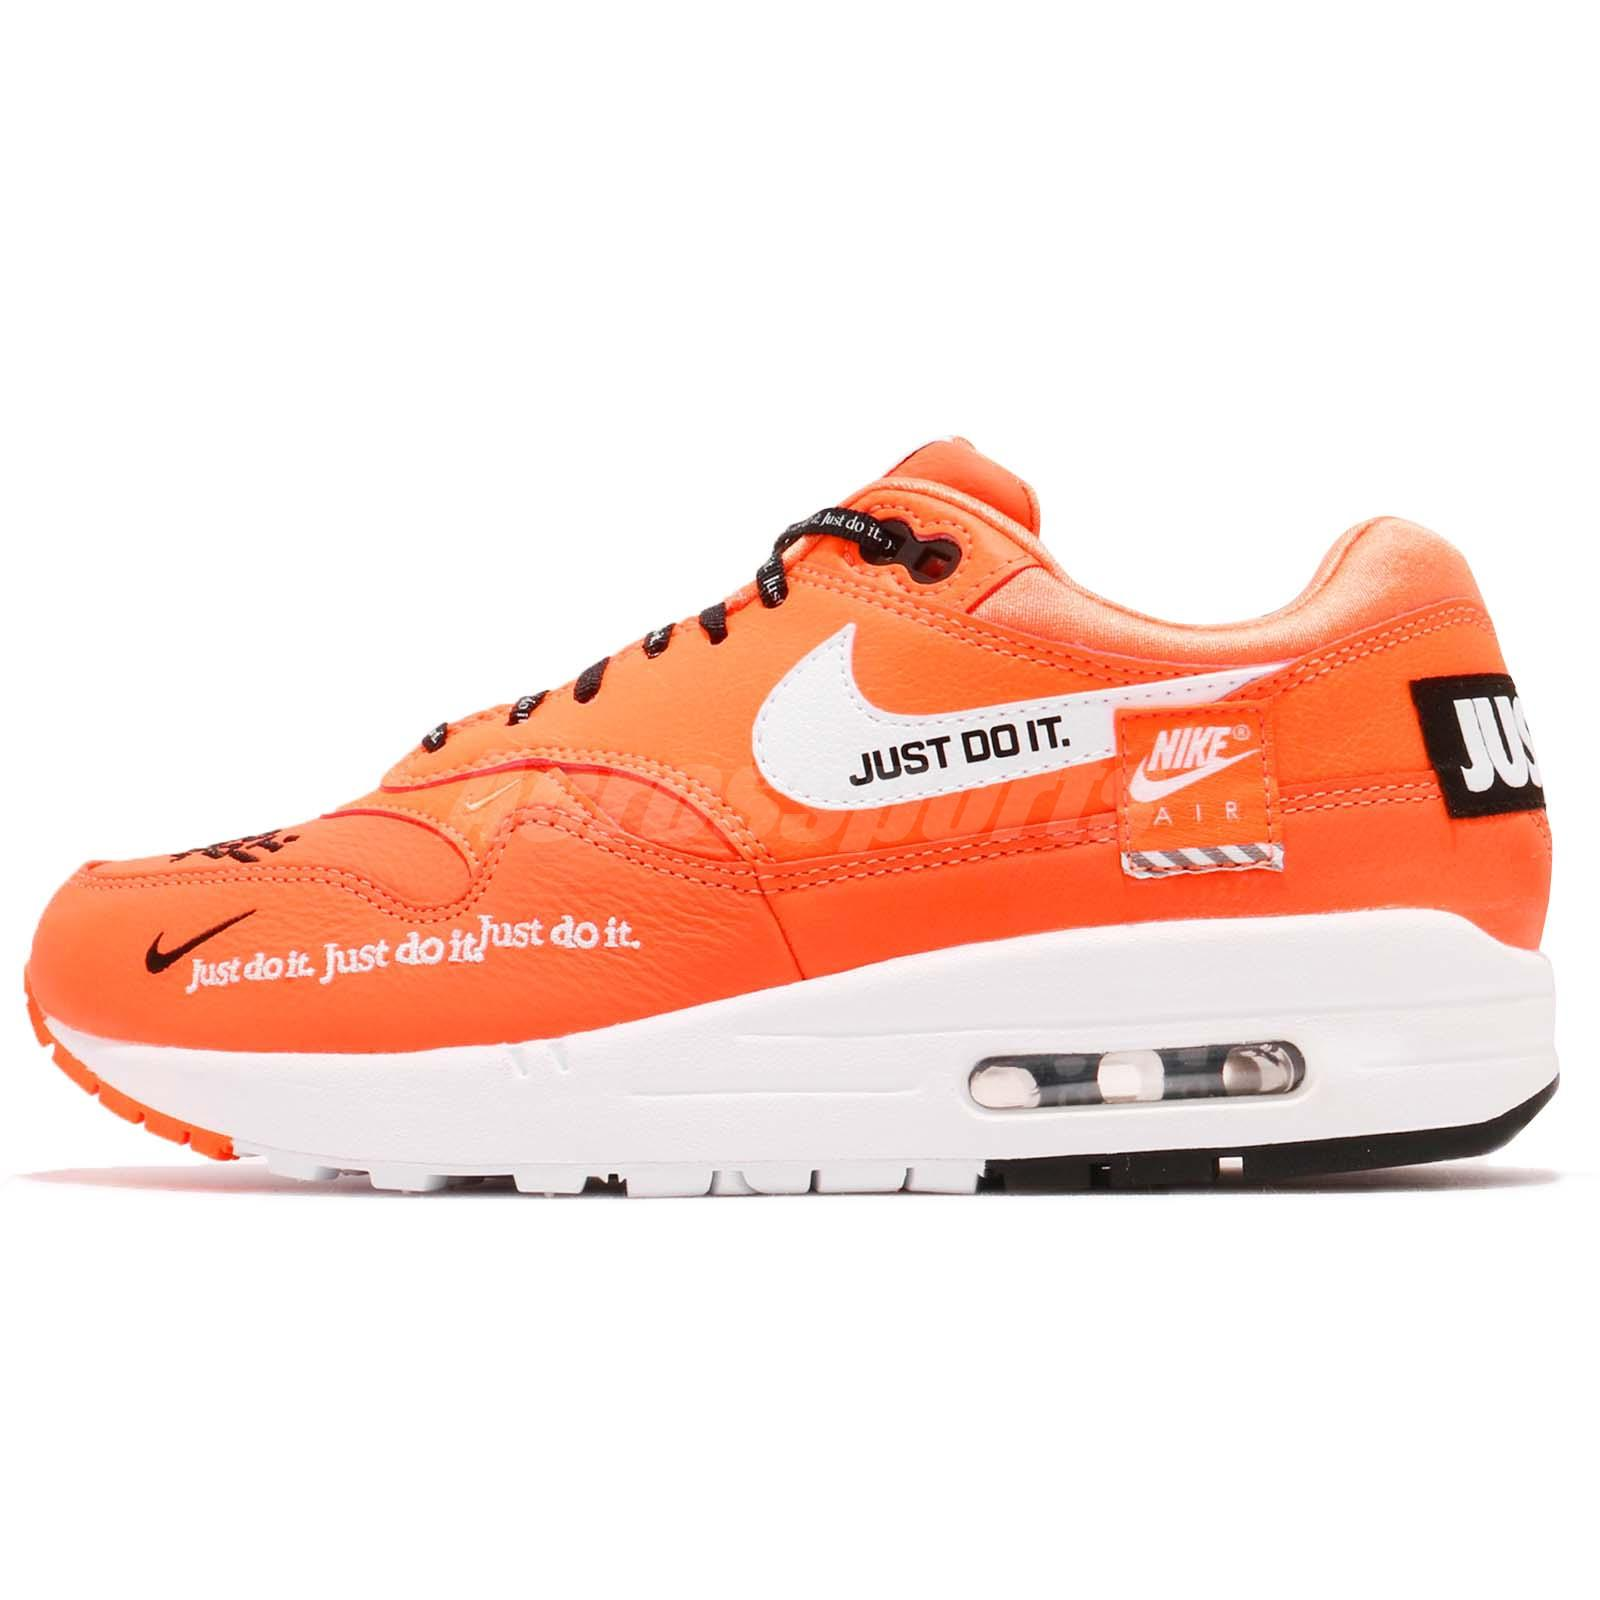 Nike Wmns Air Max 1 LX Orange Black Just Do It Pack Womens Shoes JDI  917691-800 2cc4d4979